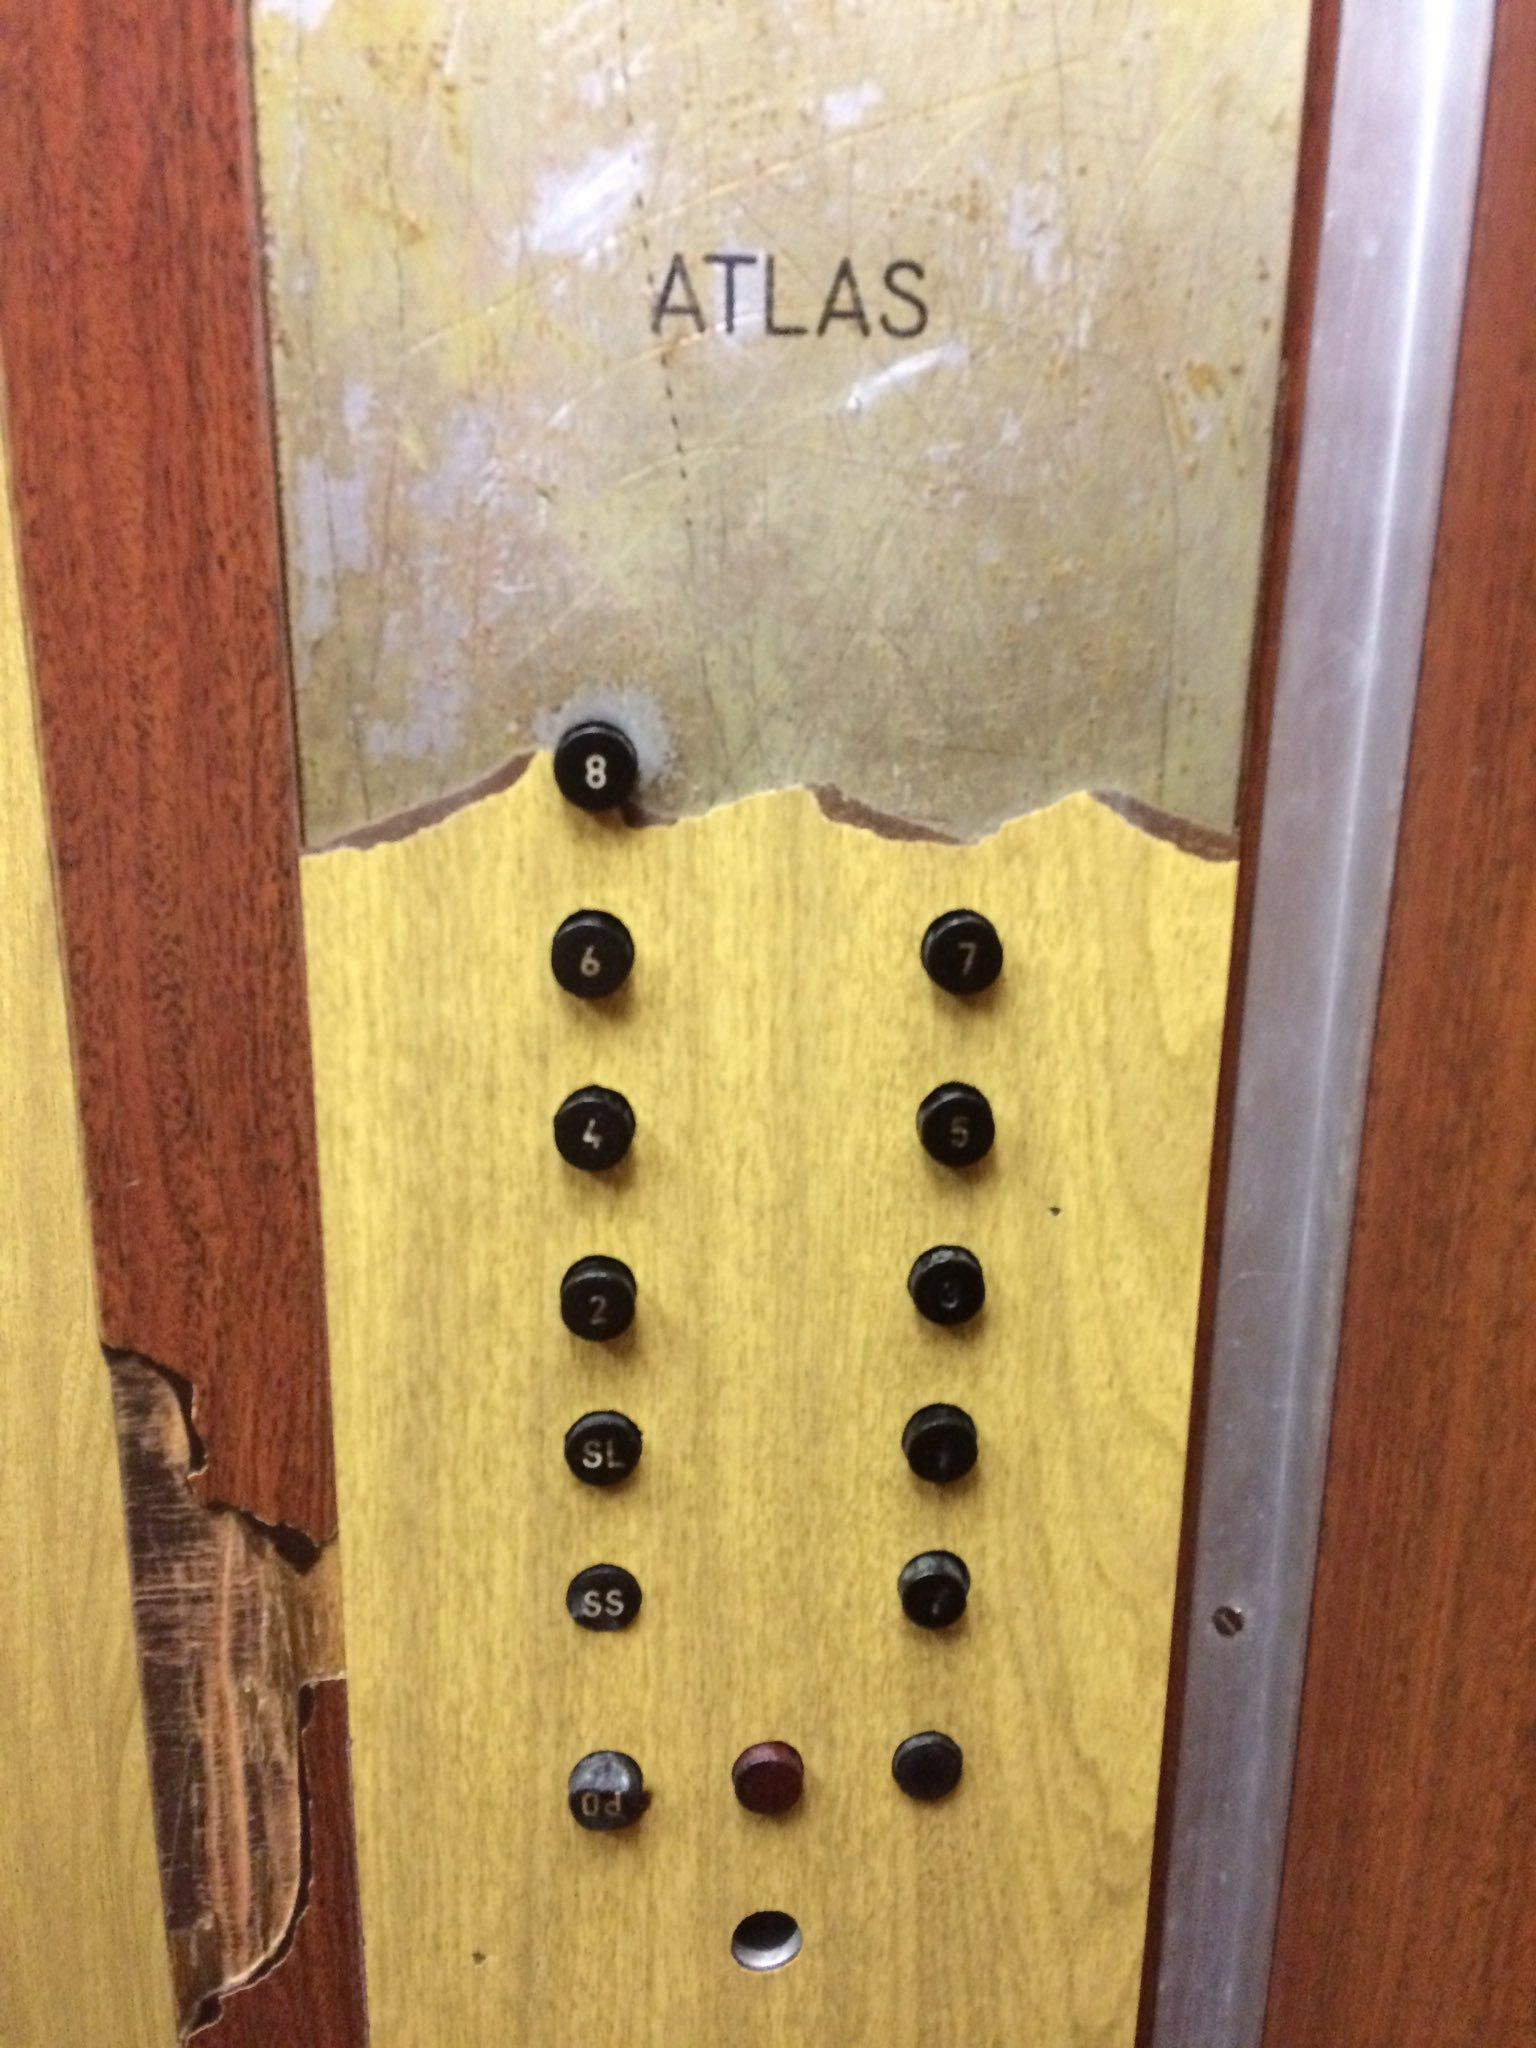 Atlas game elevator on ship